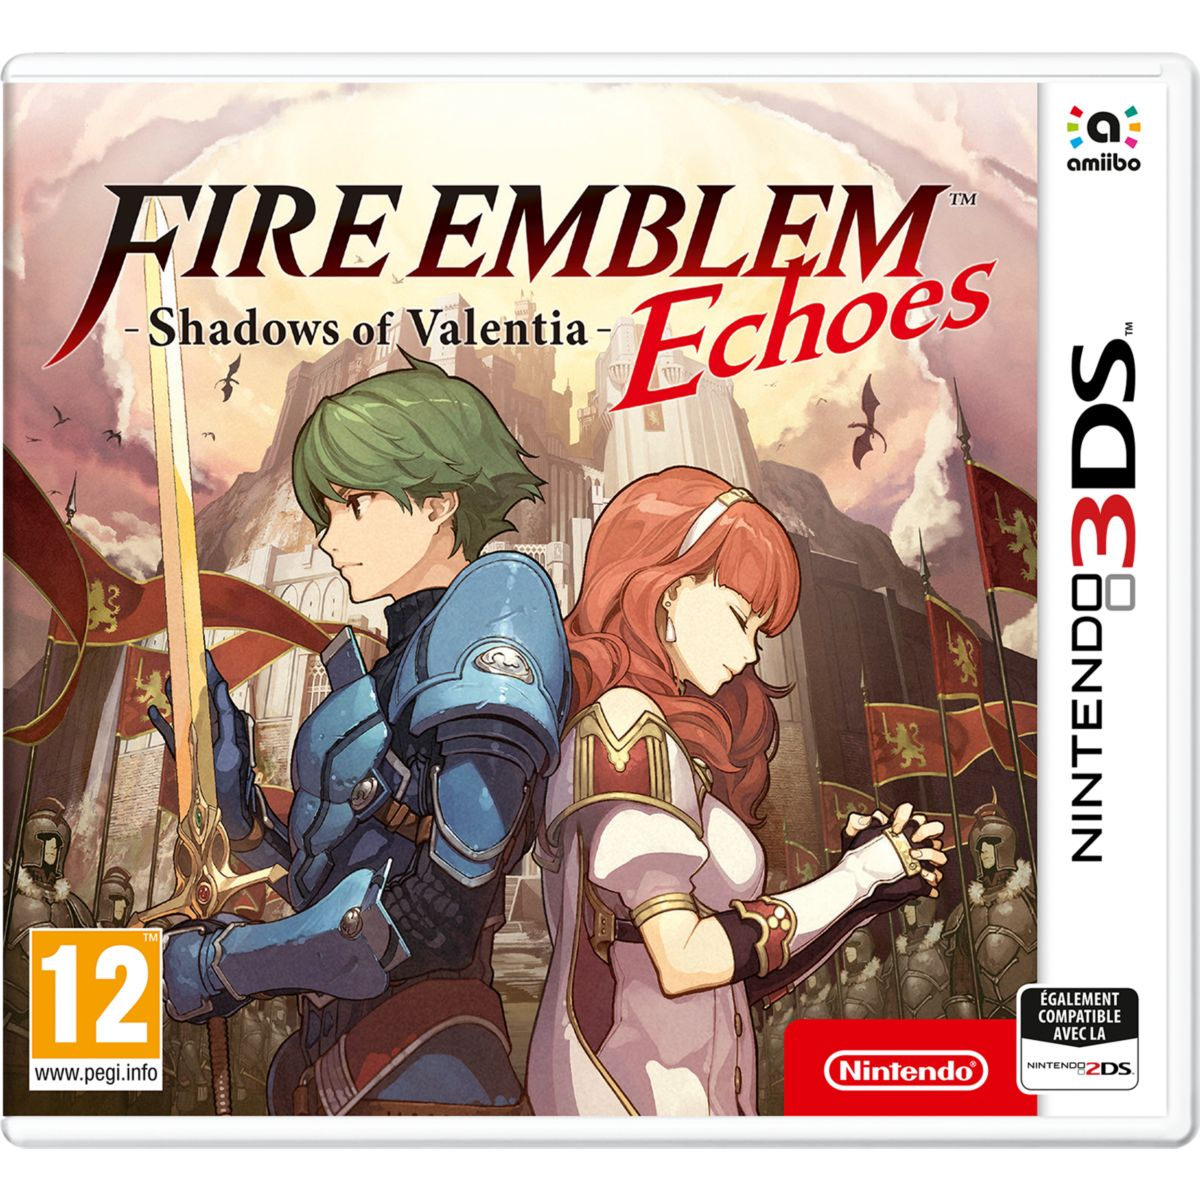 Jeu 3DS NINTENDO Fire Emblem Echoes : Sh